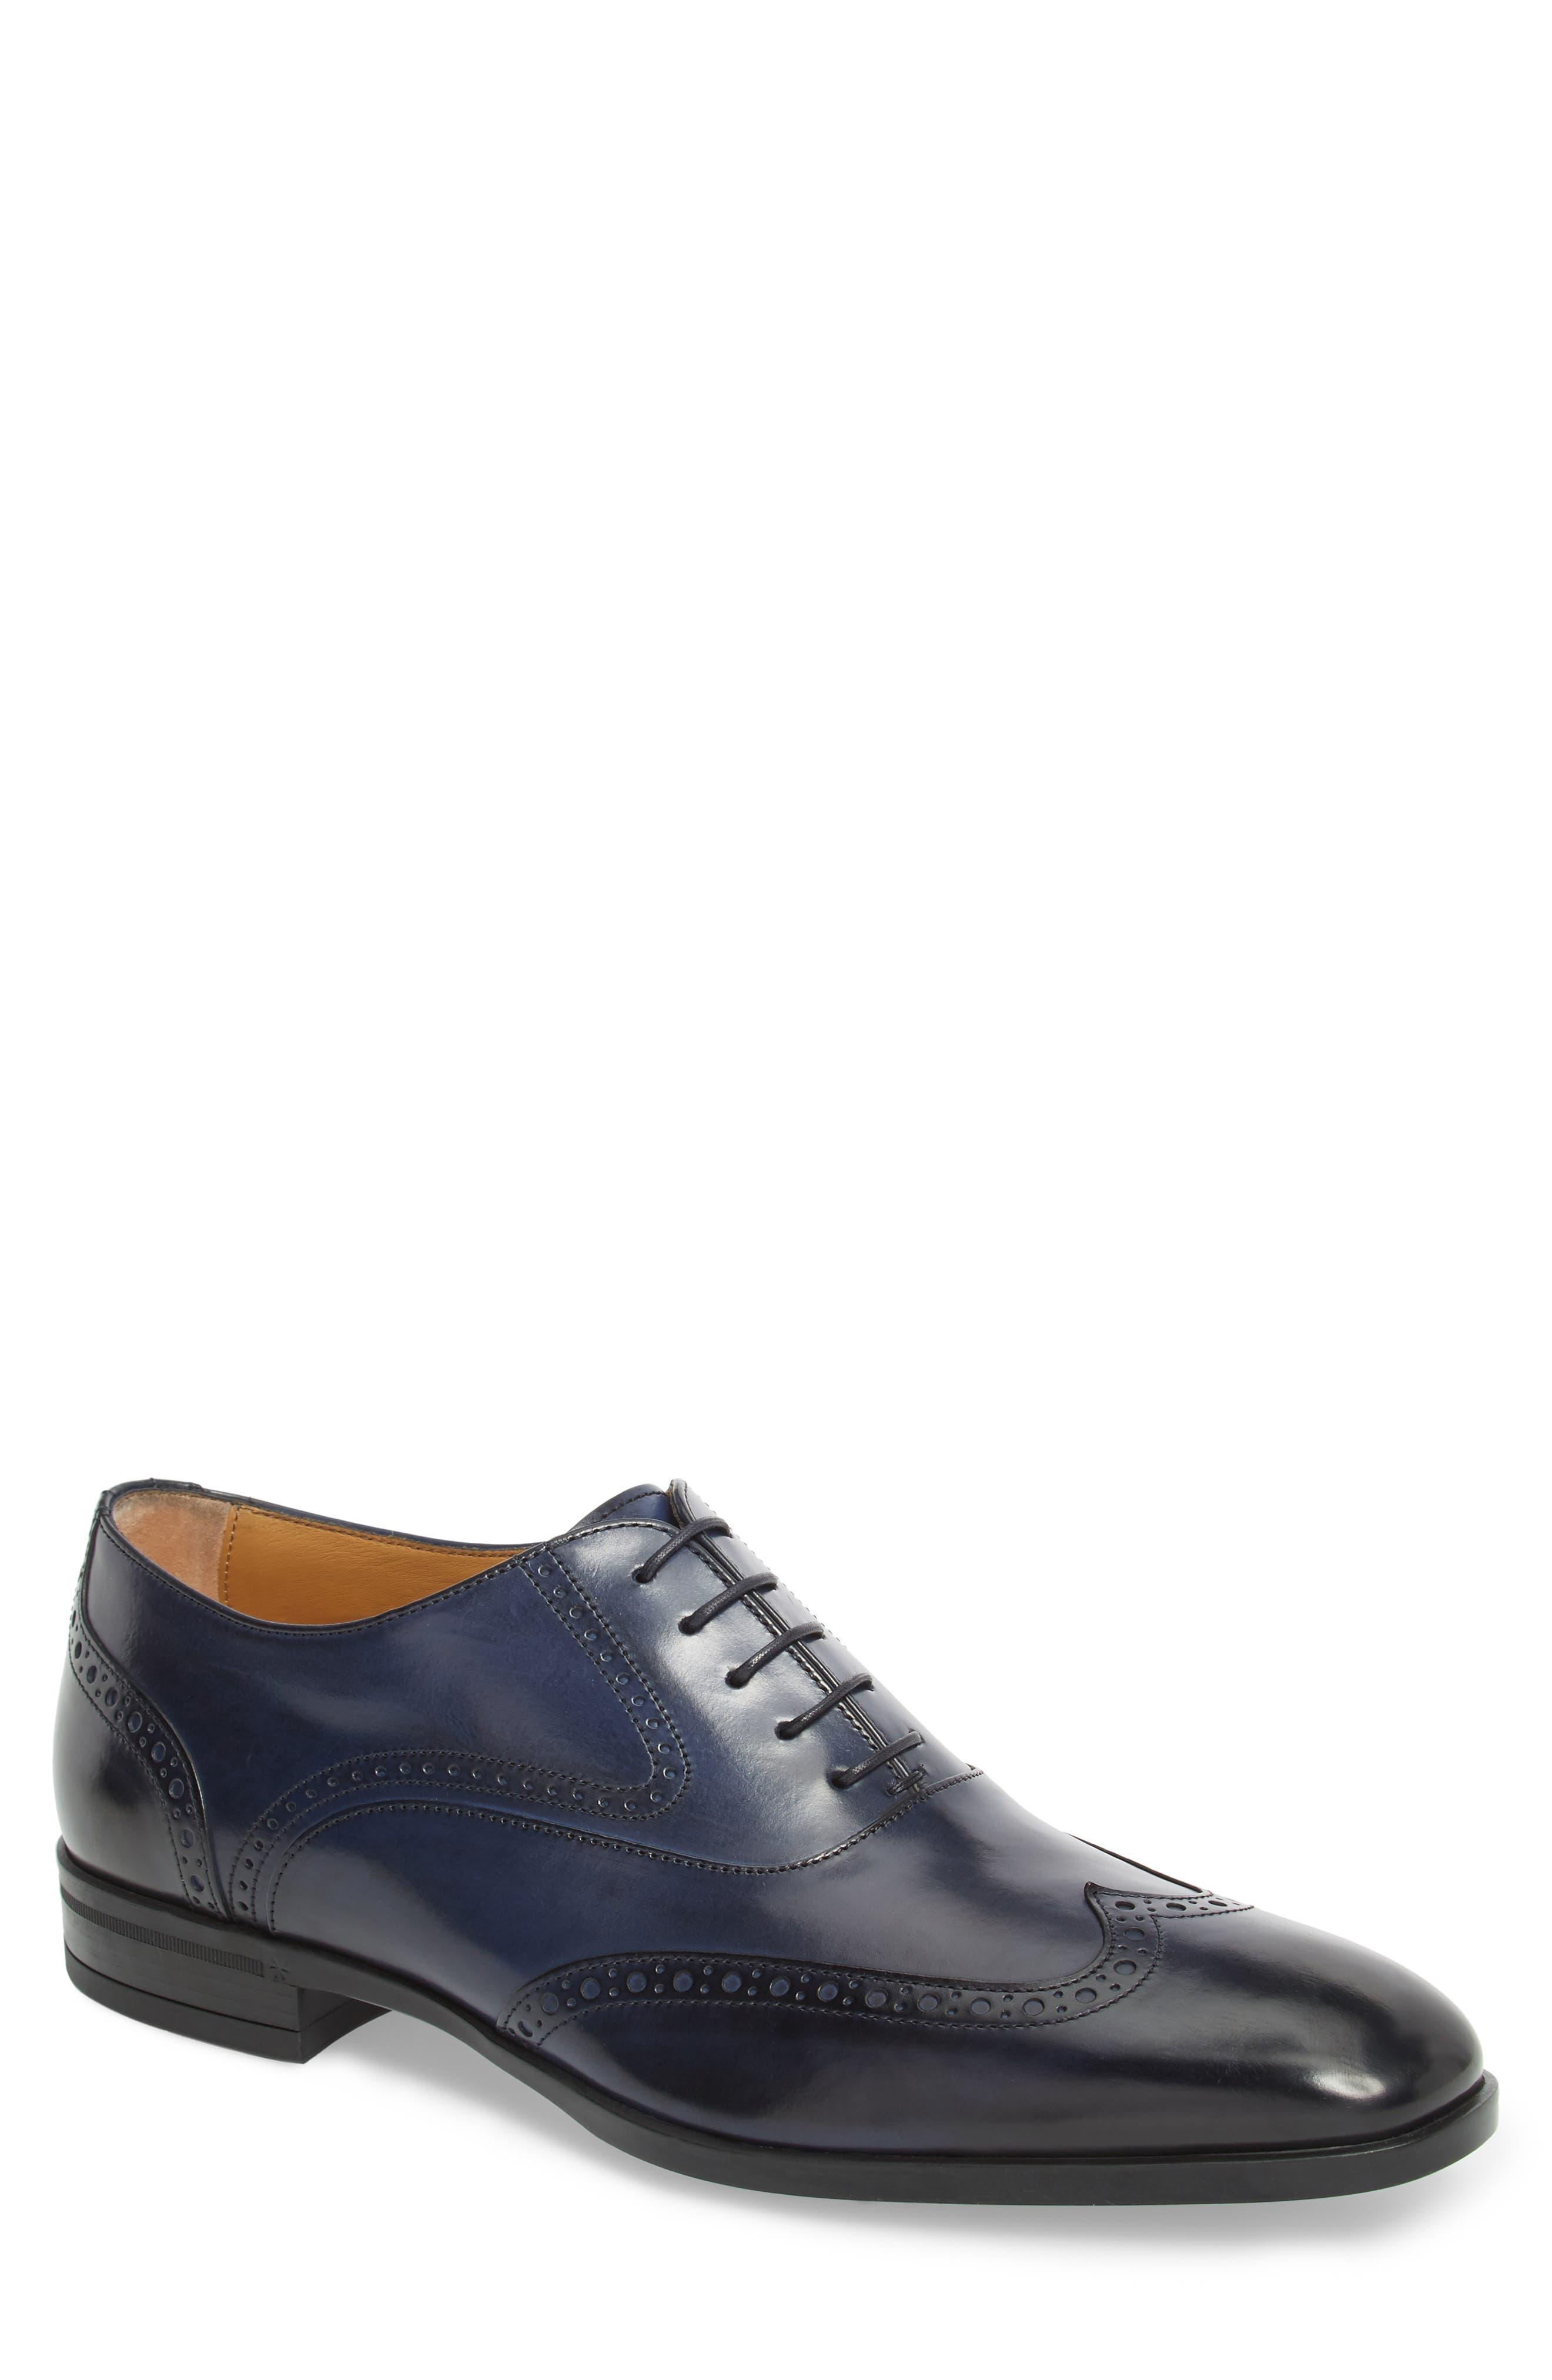 Portland Wingtip,                             Main thumbnail 1, color,                             Dark Blue Leather